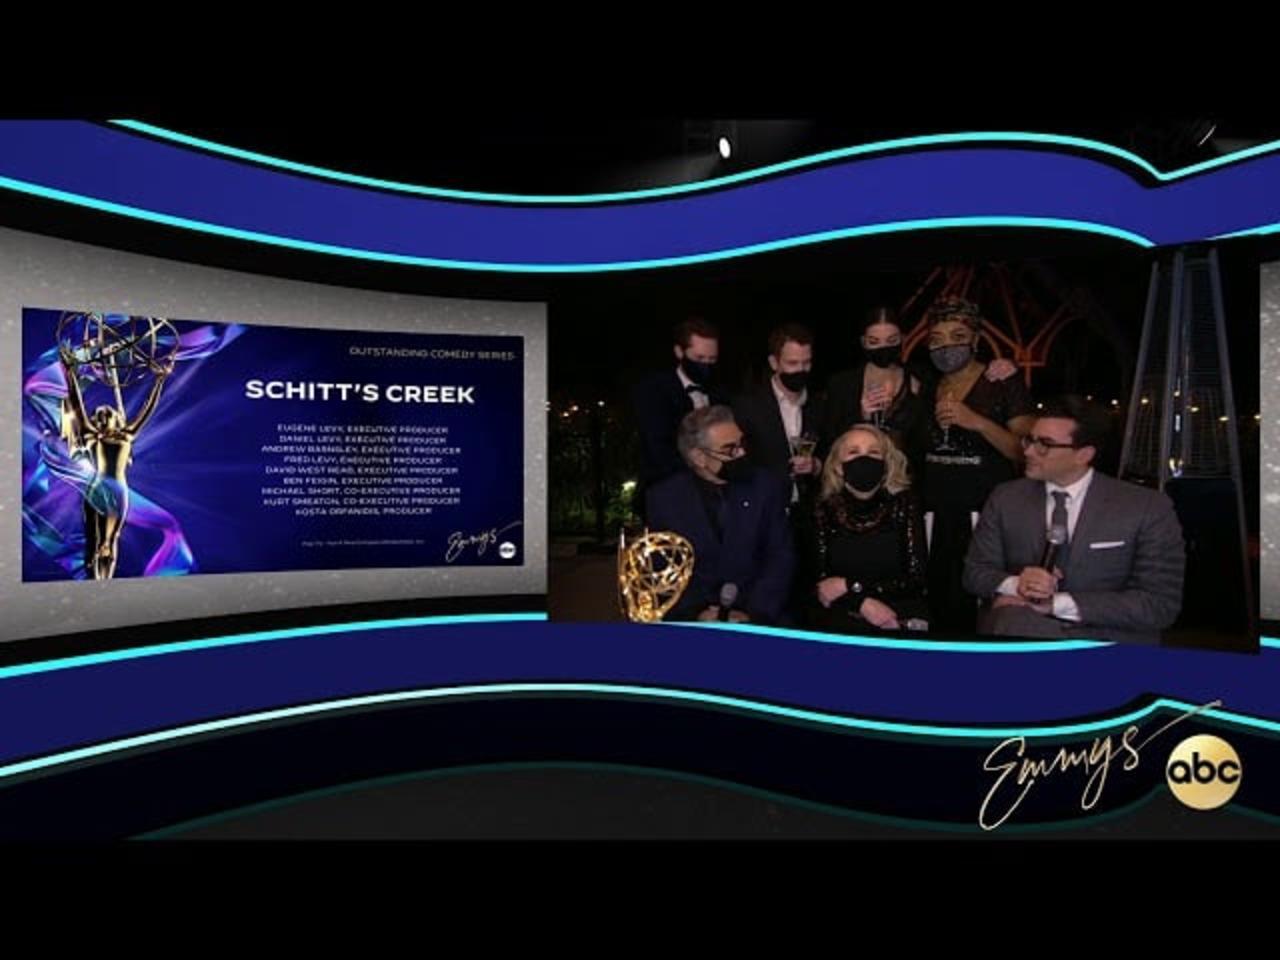 Schitt's Creek Cast Talk Historic Emmy Wins and How Their 'Gentler World' Changed LGBTQ+ TV Romances